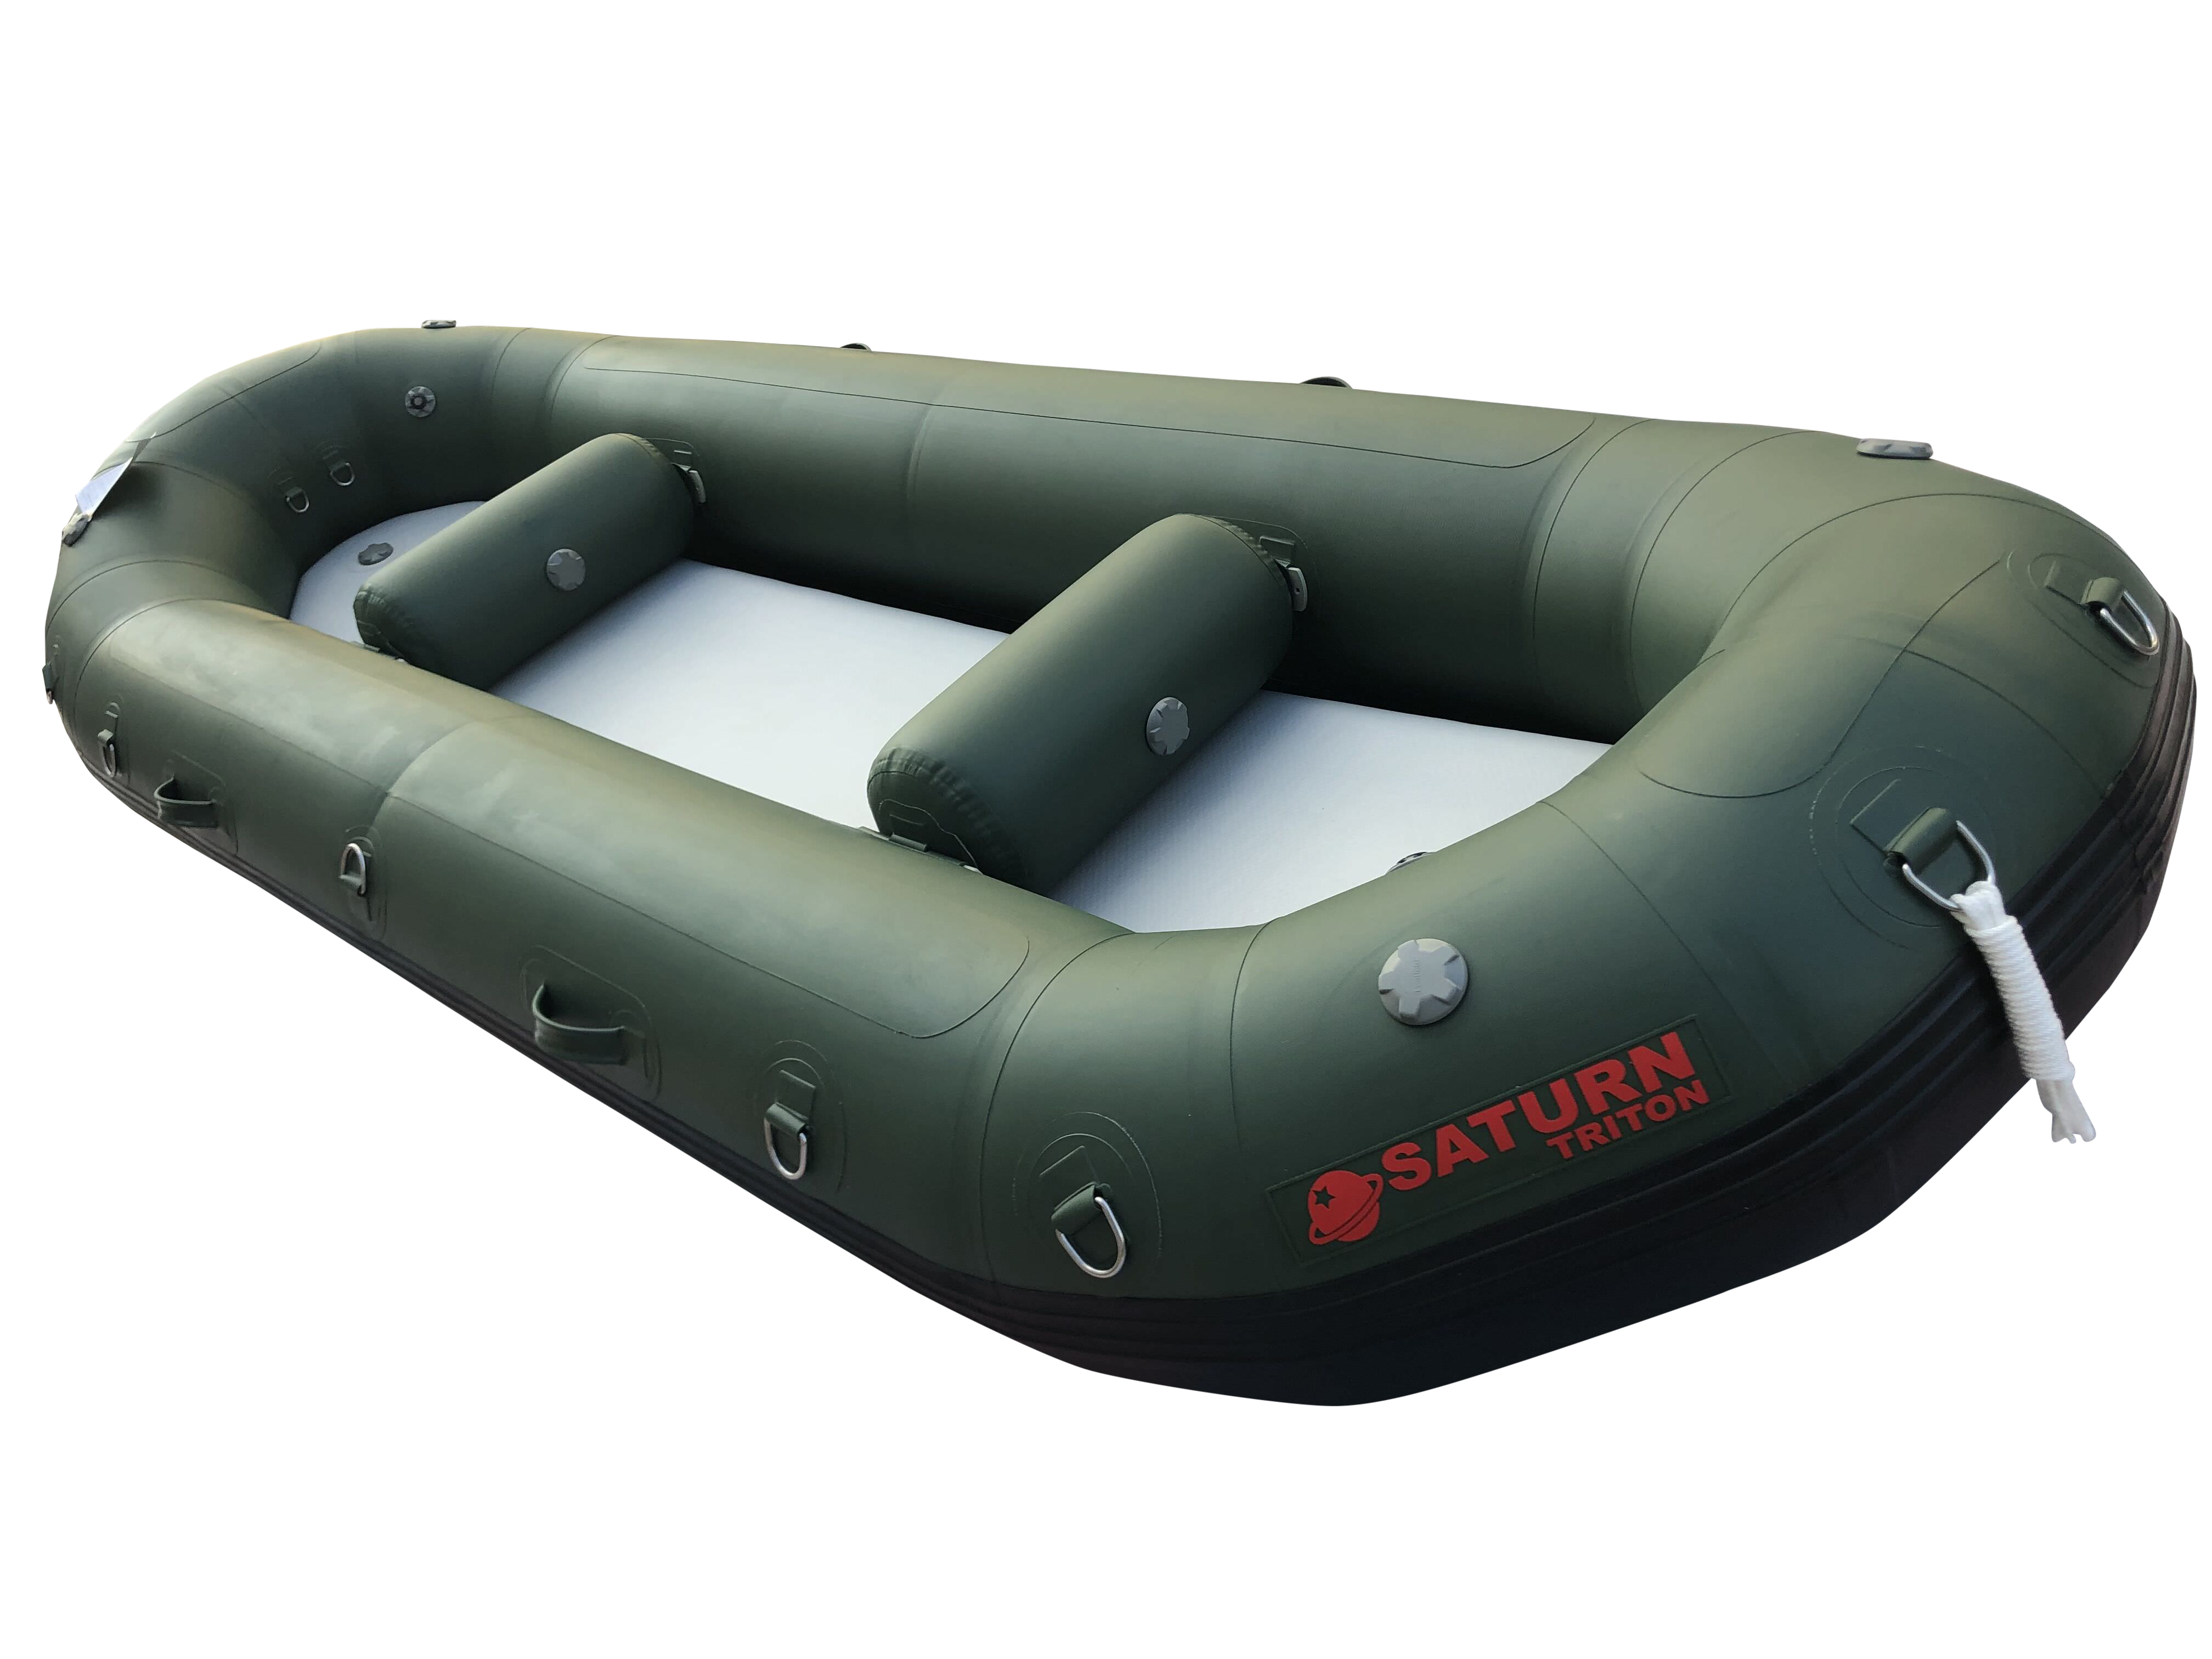 "2021 12'6"" Saturn Triton Whitewater Raft (Green)"